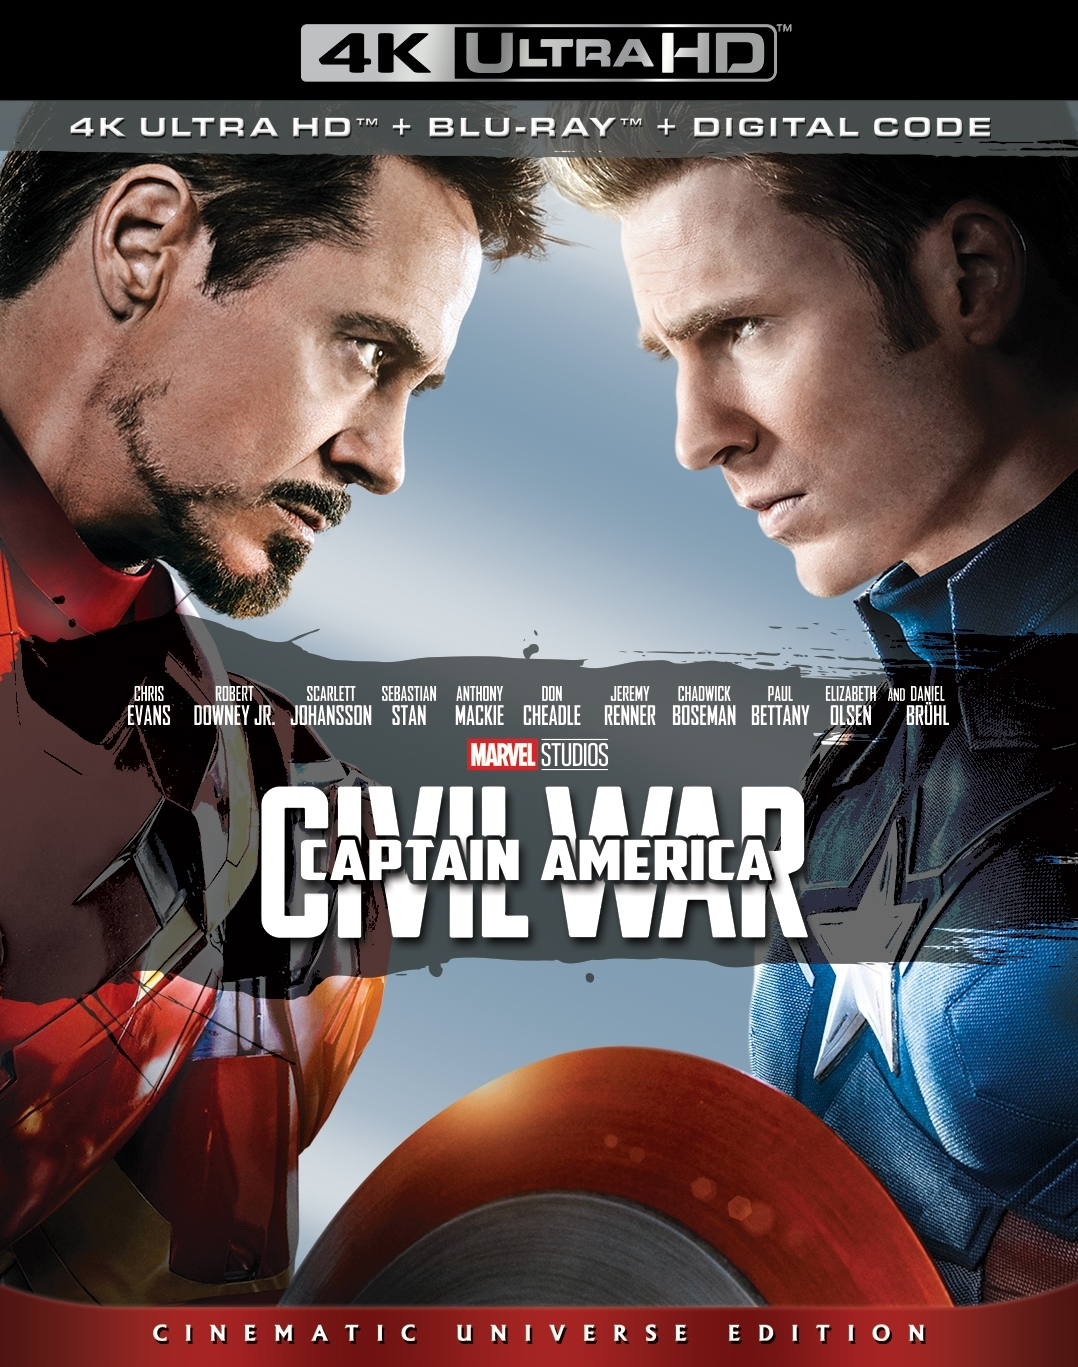 Download Captain America Civil War (2016) 2160p HDR 10bit BluRay